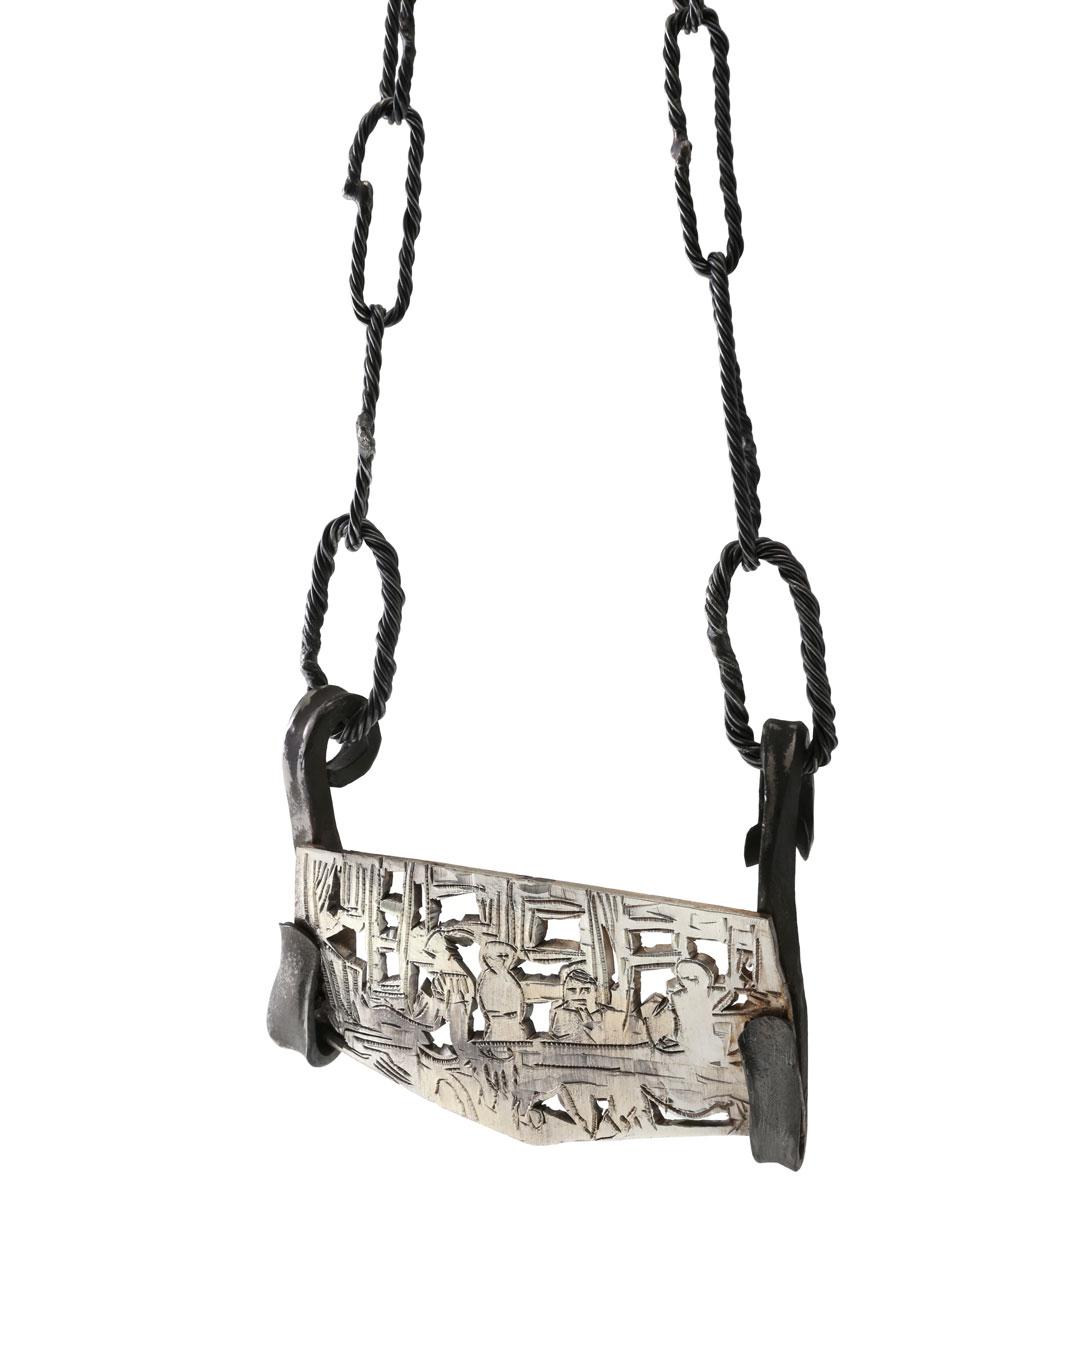 Rudolf Kocéa, Macrons Schreibtisch (Macron's Bureau), 2018, halssieraad; zilver, koper, titanium, 110 x 80 x 20 mm, €3250